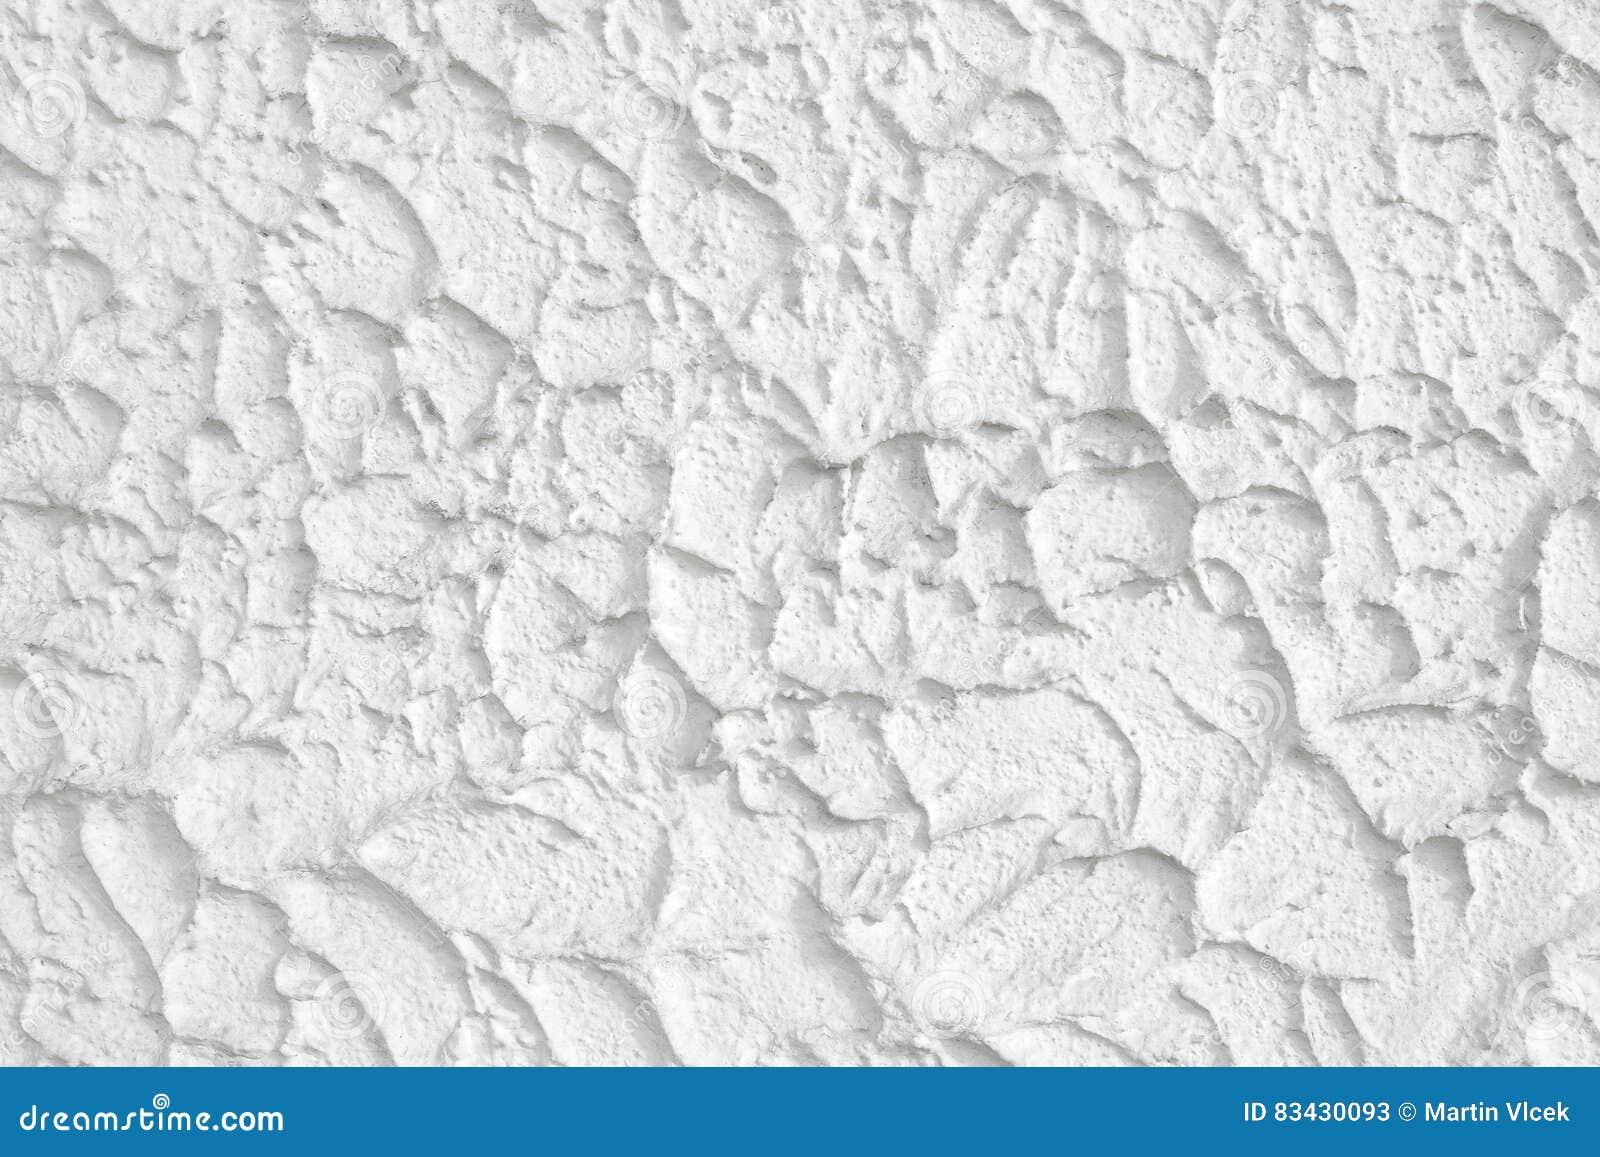 Sprayed White Plaster Stock Image Image Of Facade Architecture 83430093